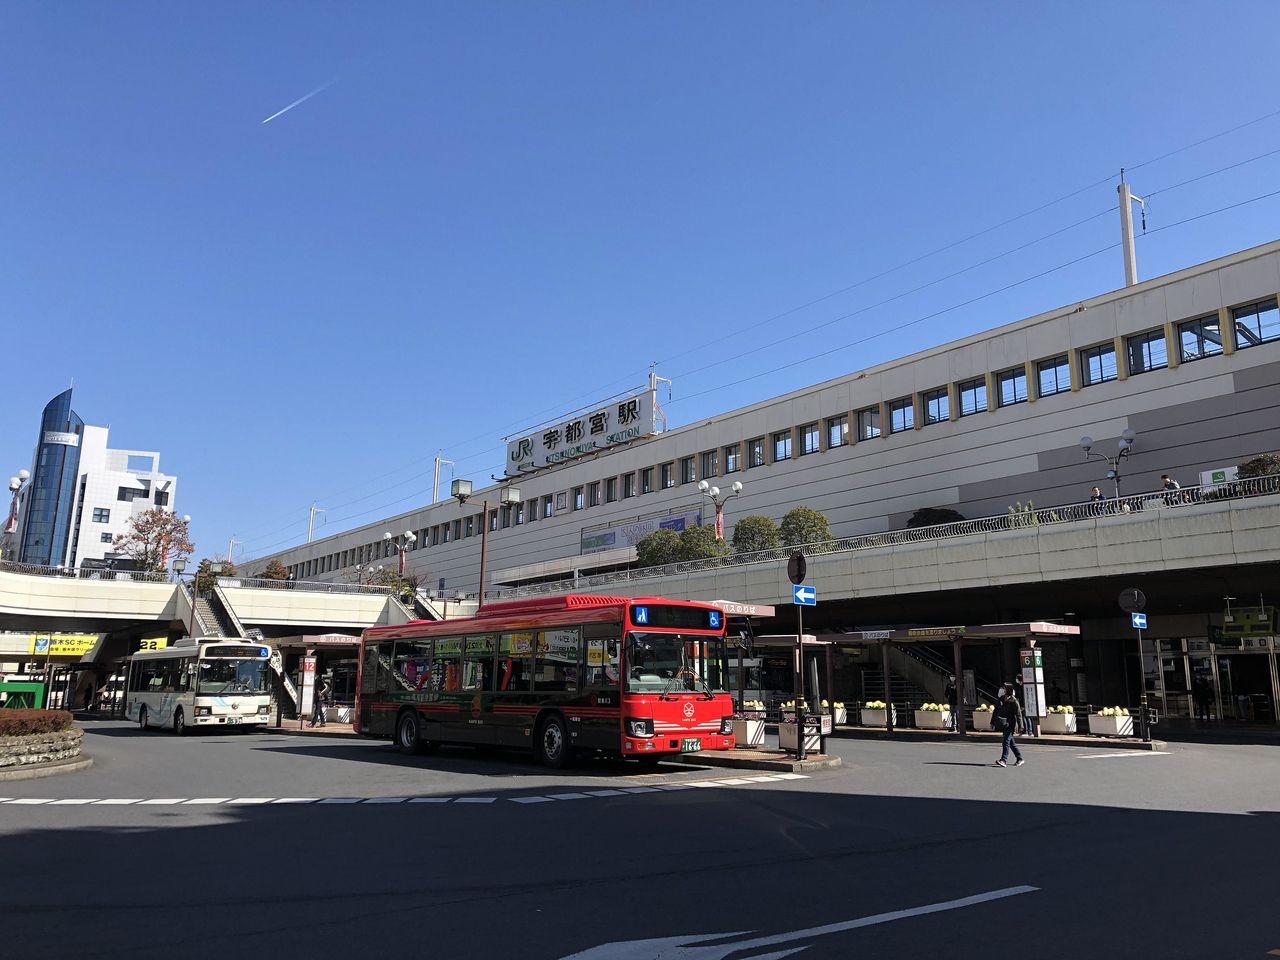 宇都宮駅 西口 関東自動車バス乗り場